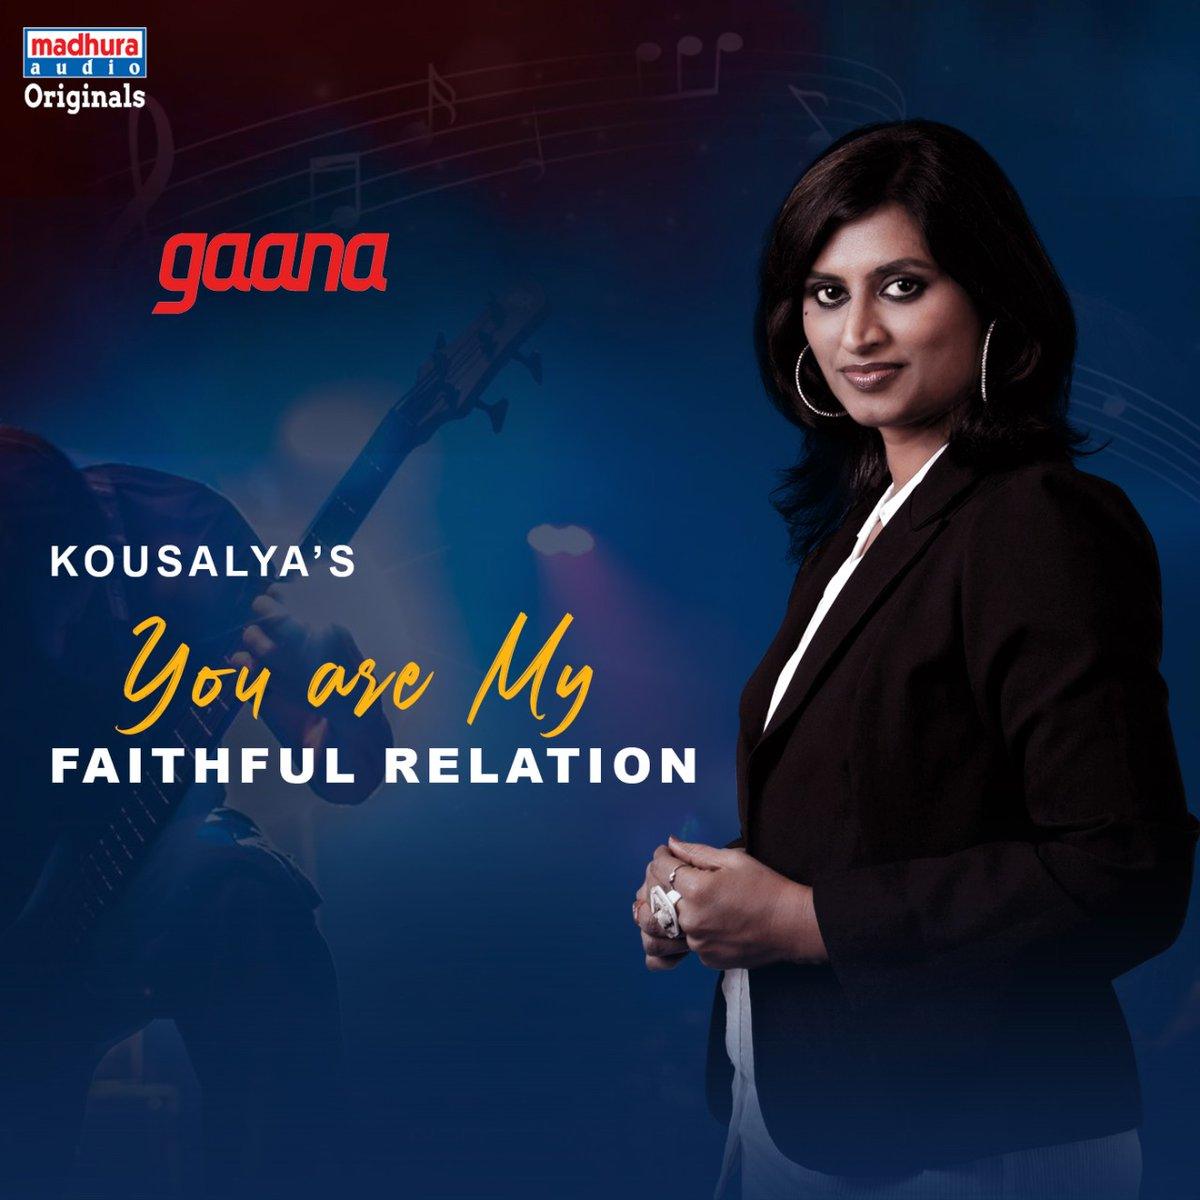 Talented Singer @Kousalyapotturi's #YouAreMyFaithfulRelation IS Streaming On Your Favorite OTT App  @gaana: https://gaana.com/song/you-are-my-faithful-relation…pic.twitter.com/Y11NQHvGfZ